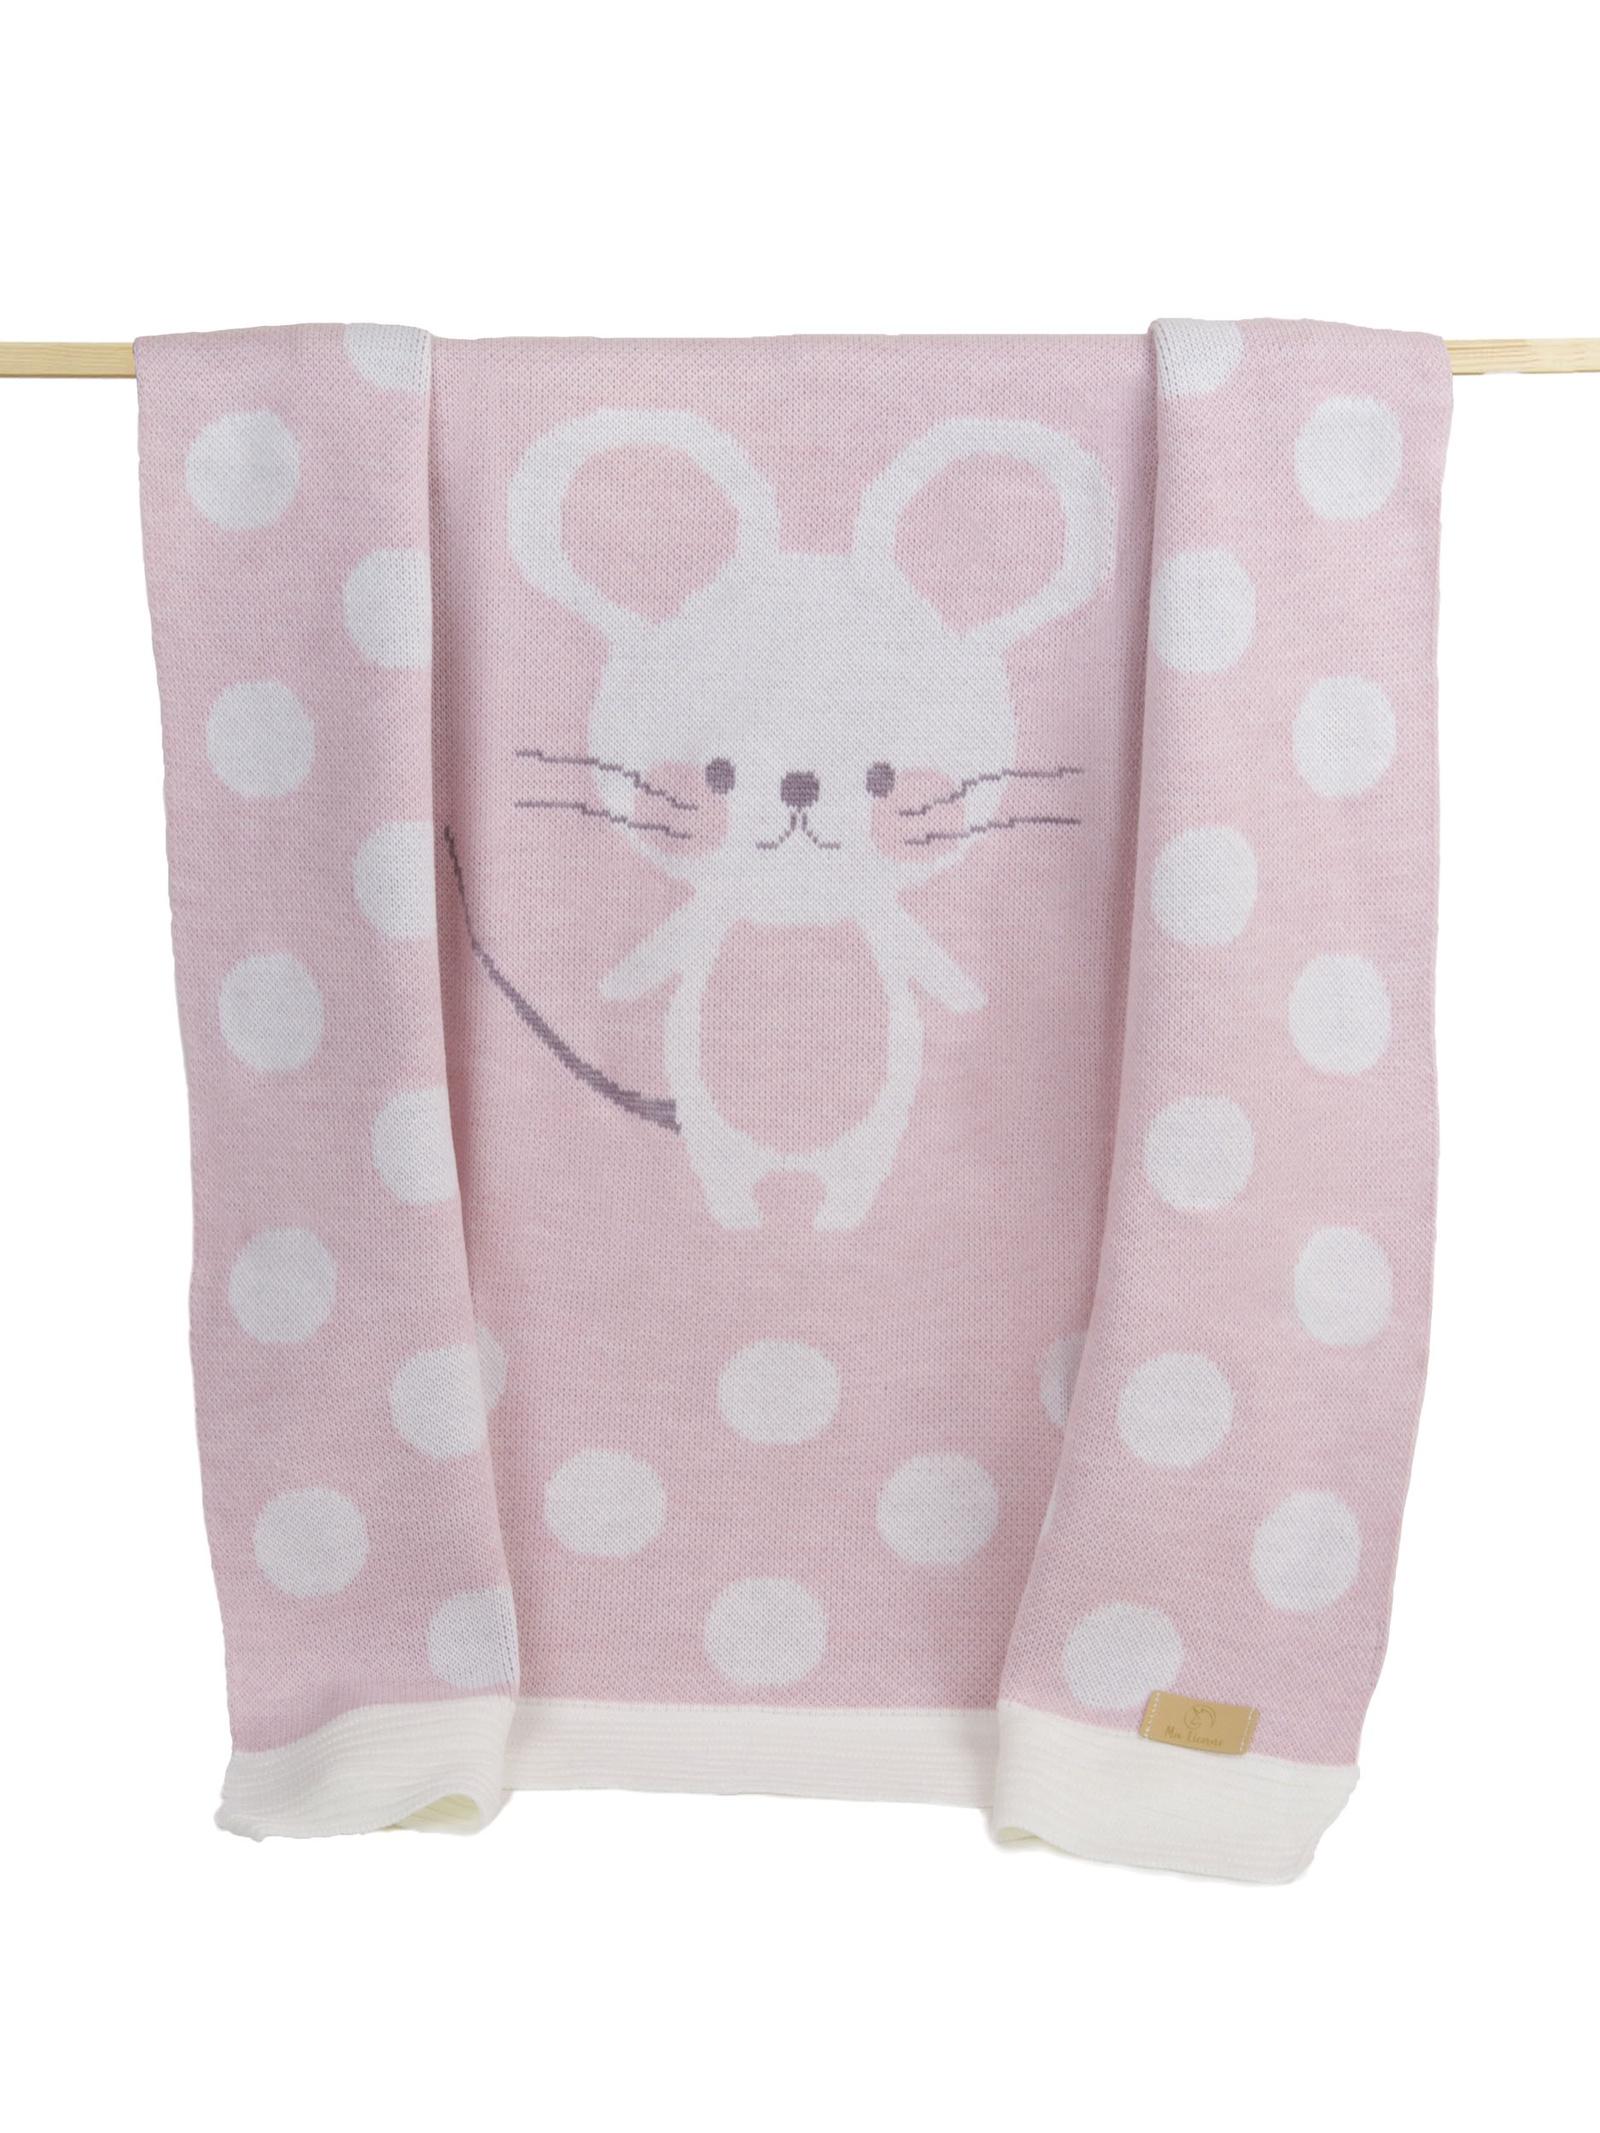 Фото - Плед детский Ma Licorne Petite mickey Rose (розовый), 1х1 м пледы и полотенца